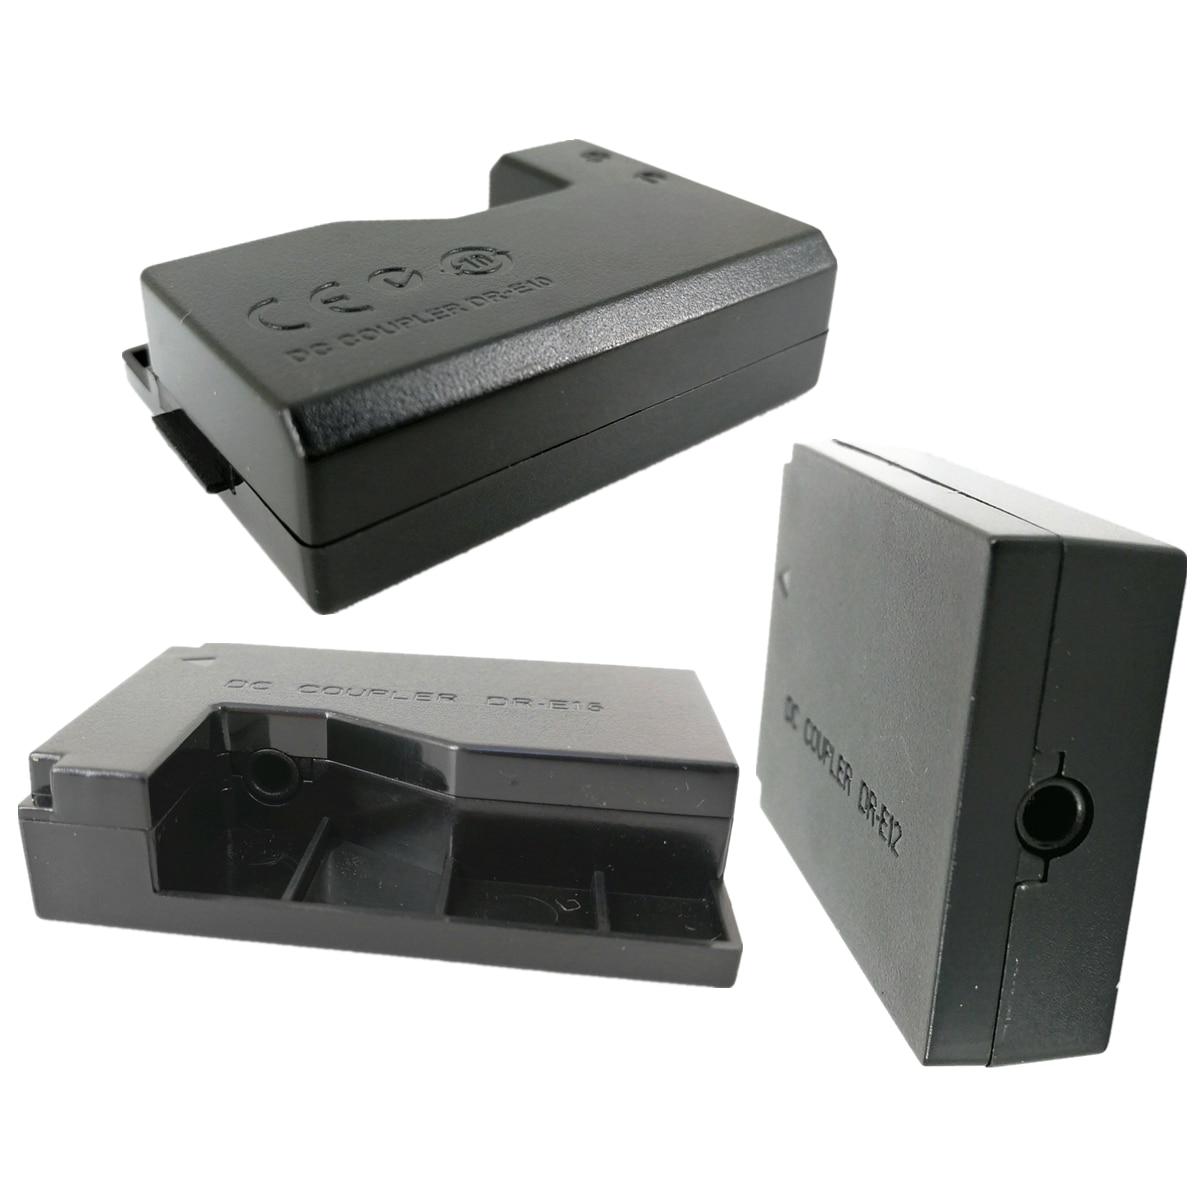 Dummy Battery DC Coupler Power Supply Adapter Replace DR-E10 DR-E12 DR-E15 For Canon LP-E10 LP-E12 ACK-E15 ACK-E12 ACK-E10